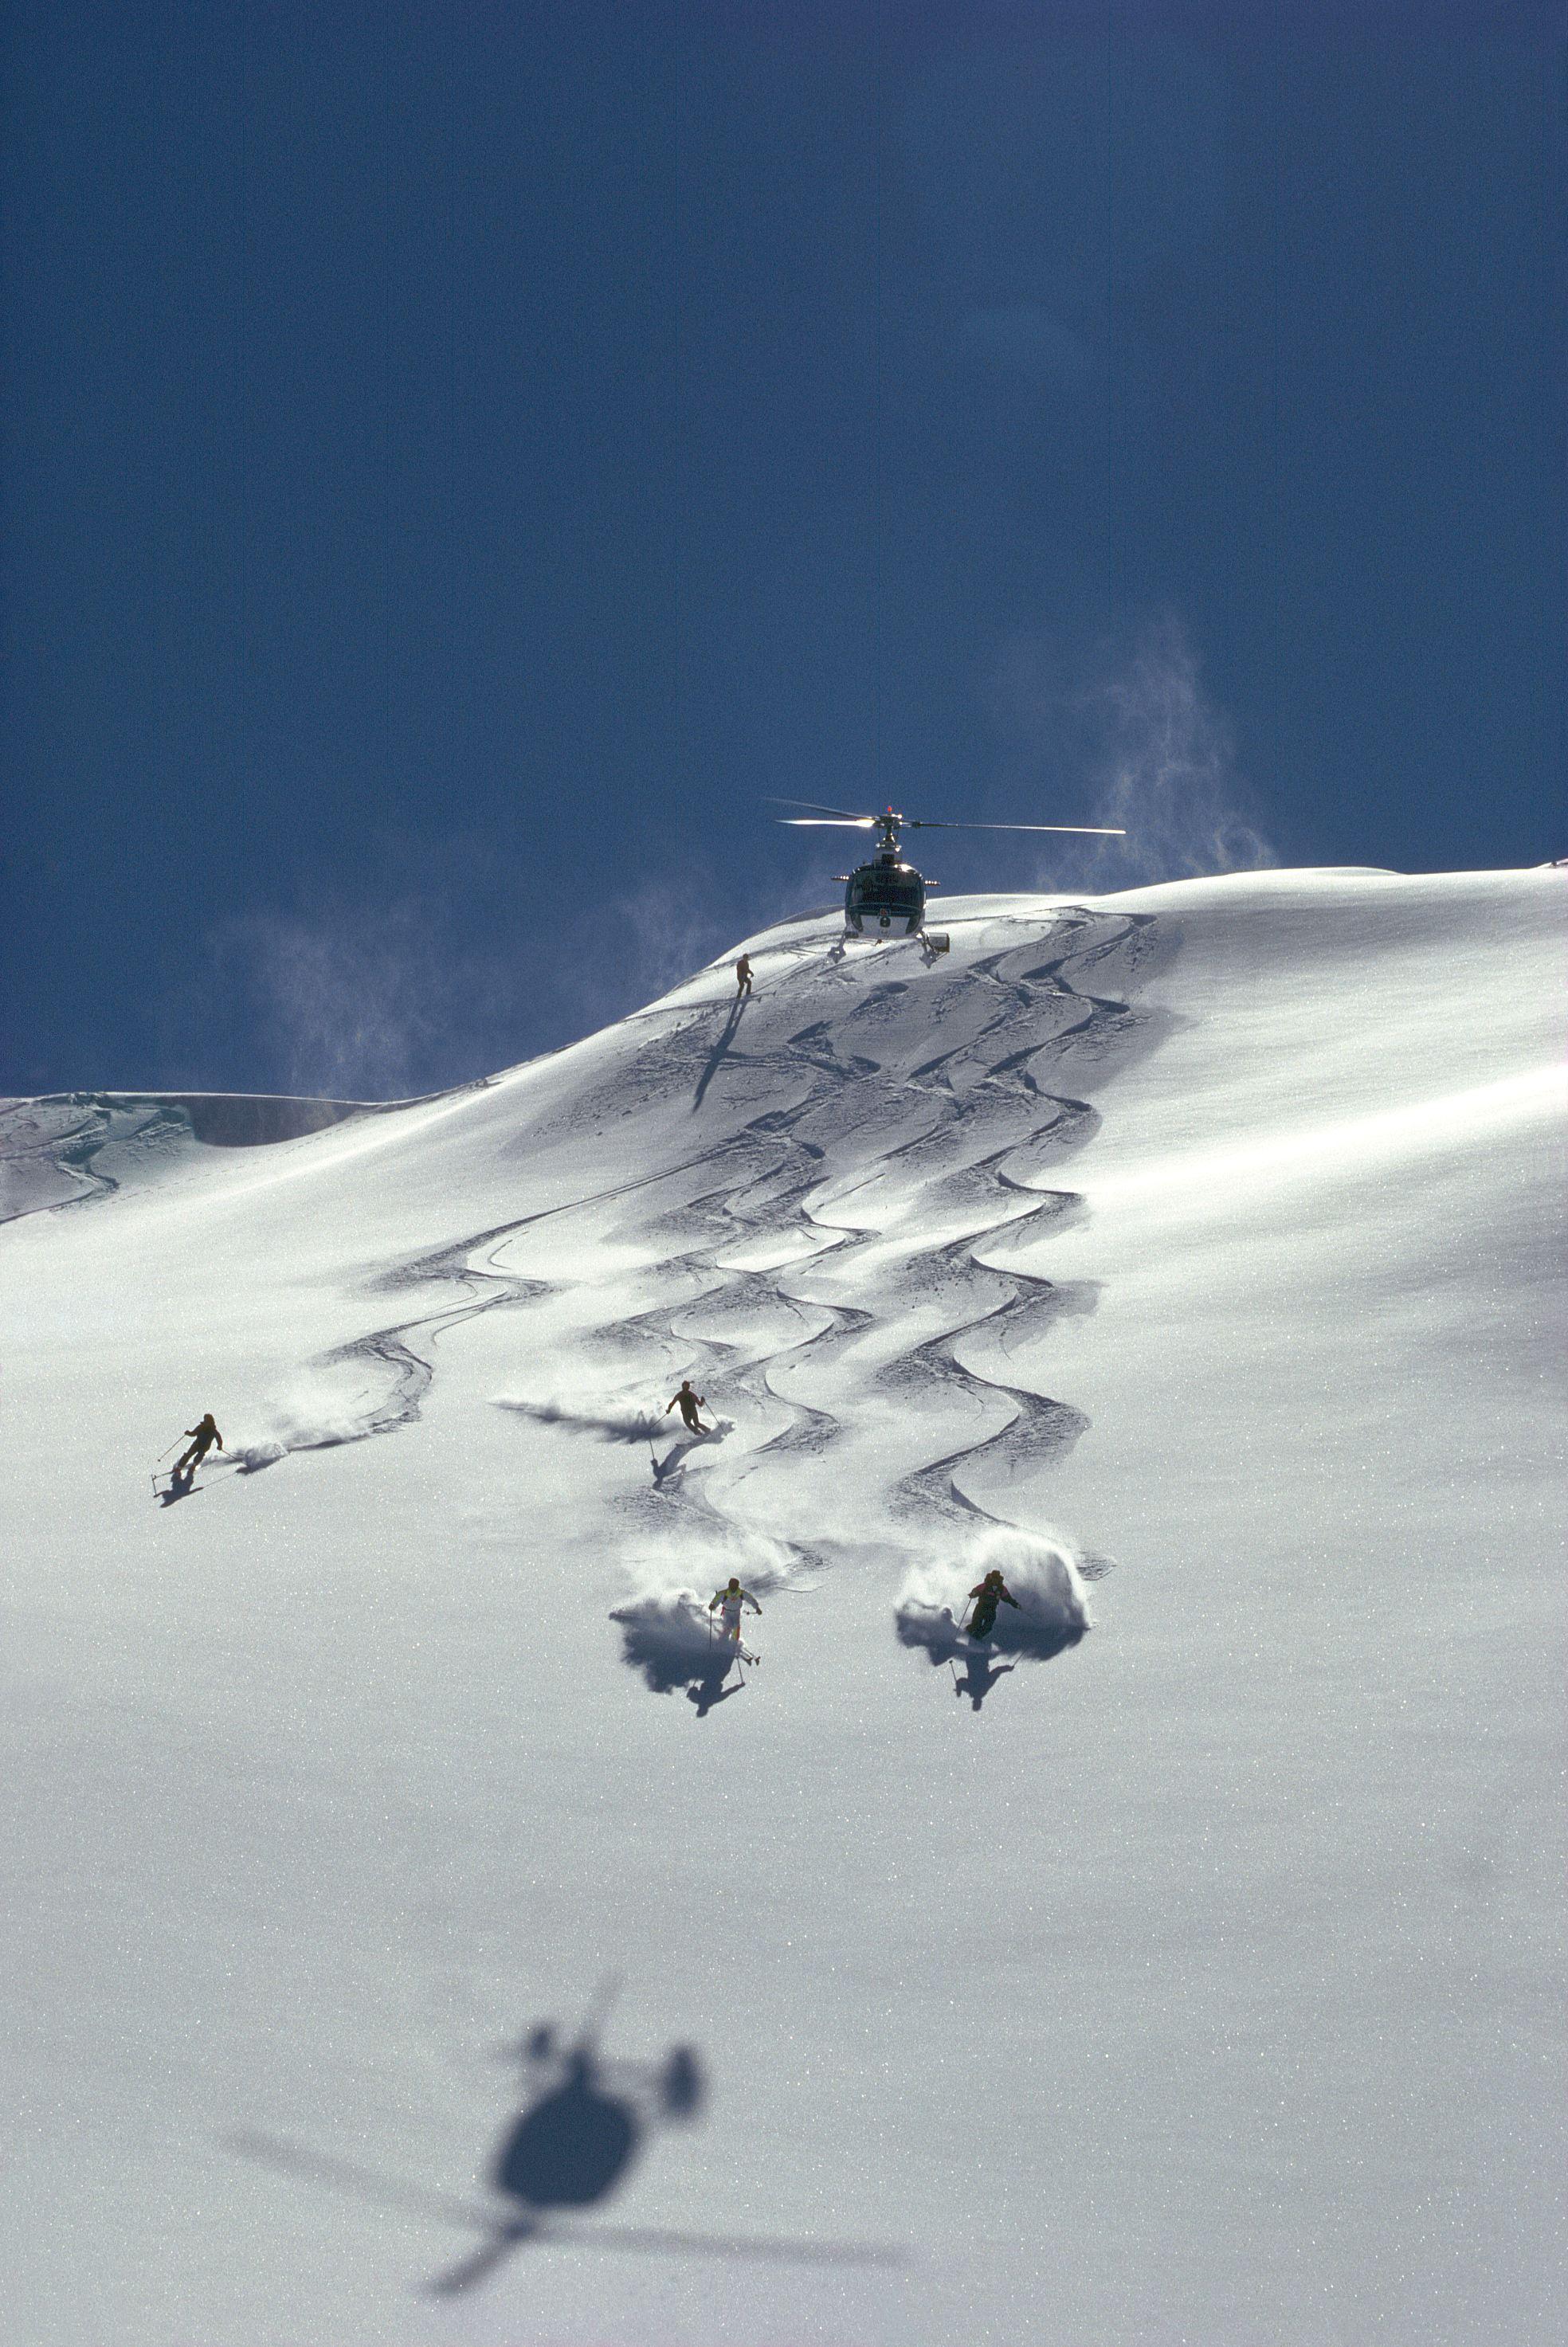 Stage Héliski/Free Ride/ski de randonnée